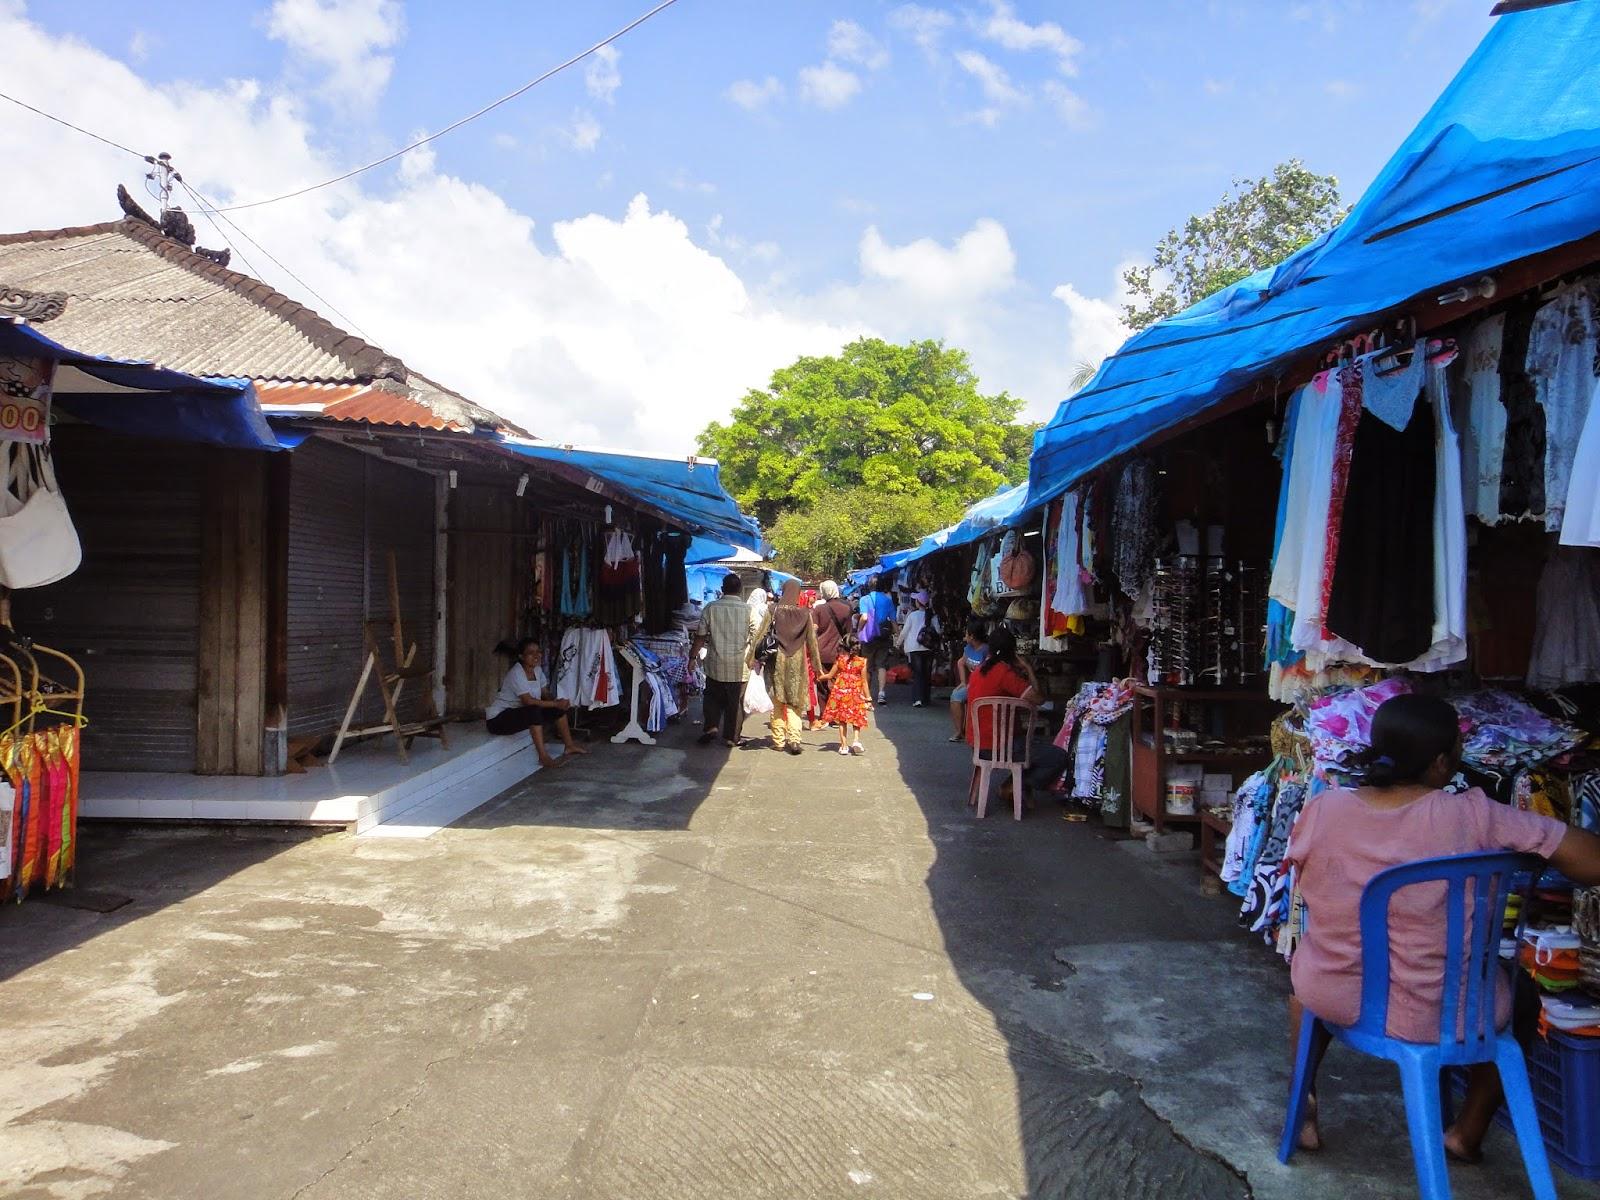 Pura Tanah Lot Market Bali Island